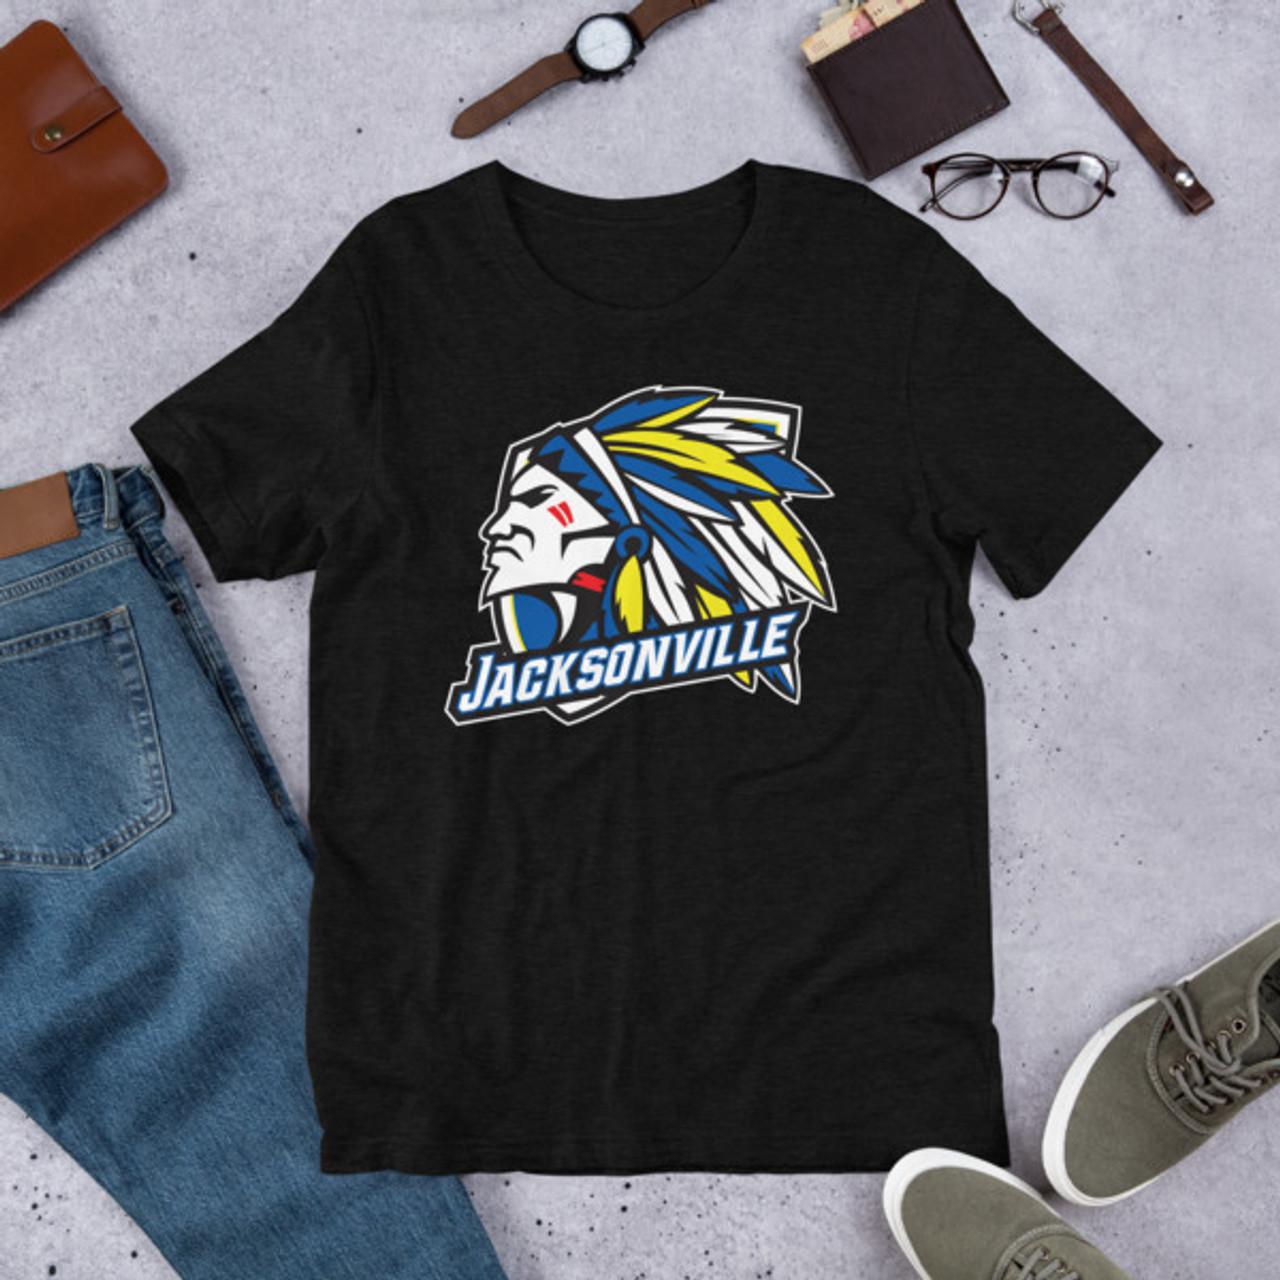 Jacksonville Indian Short-Sleeve Unisex T-Shirt